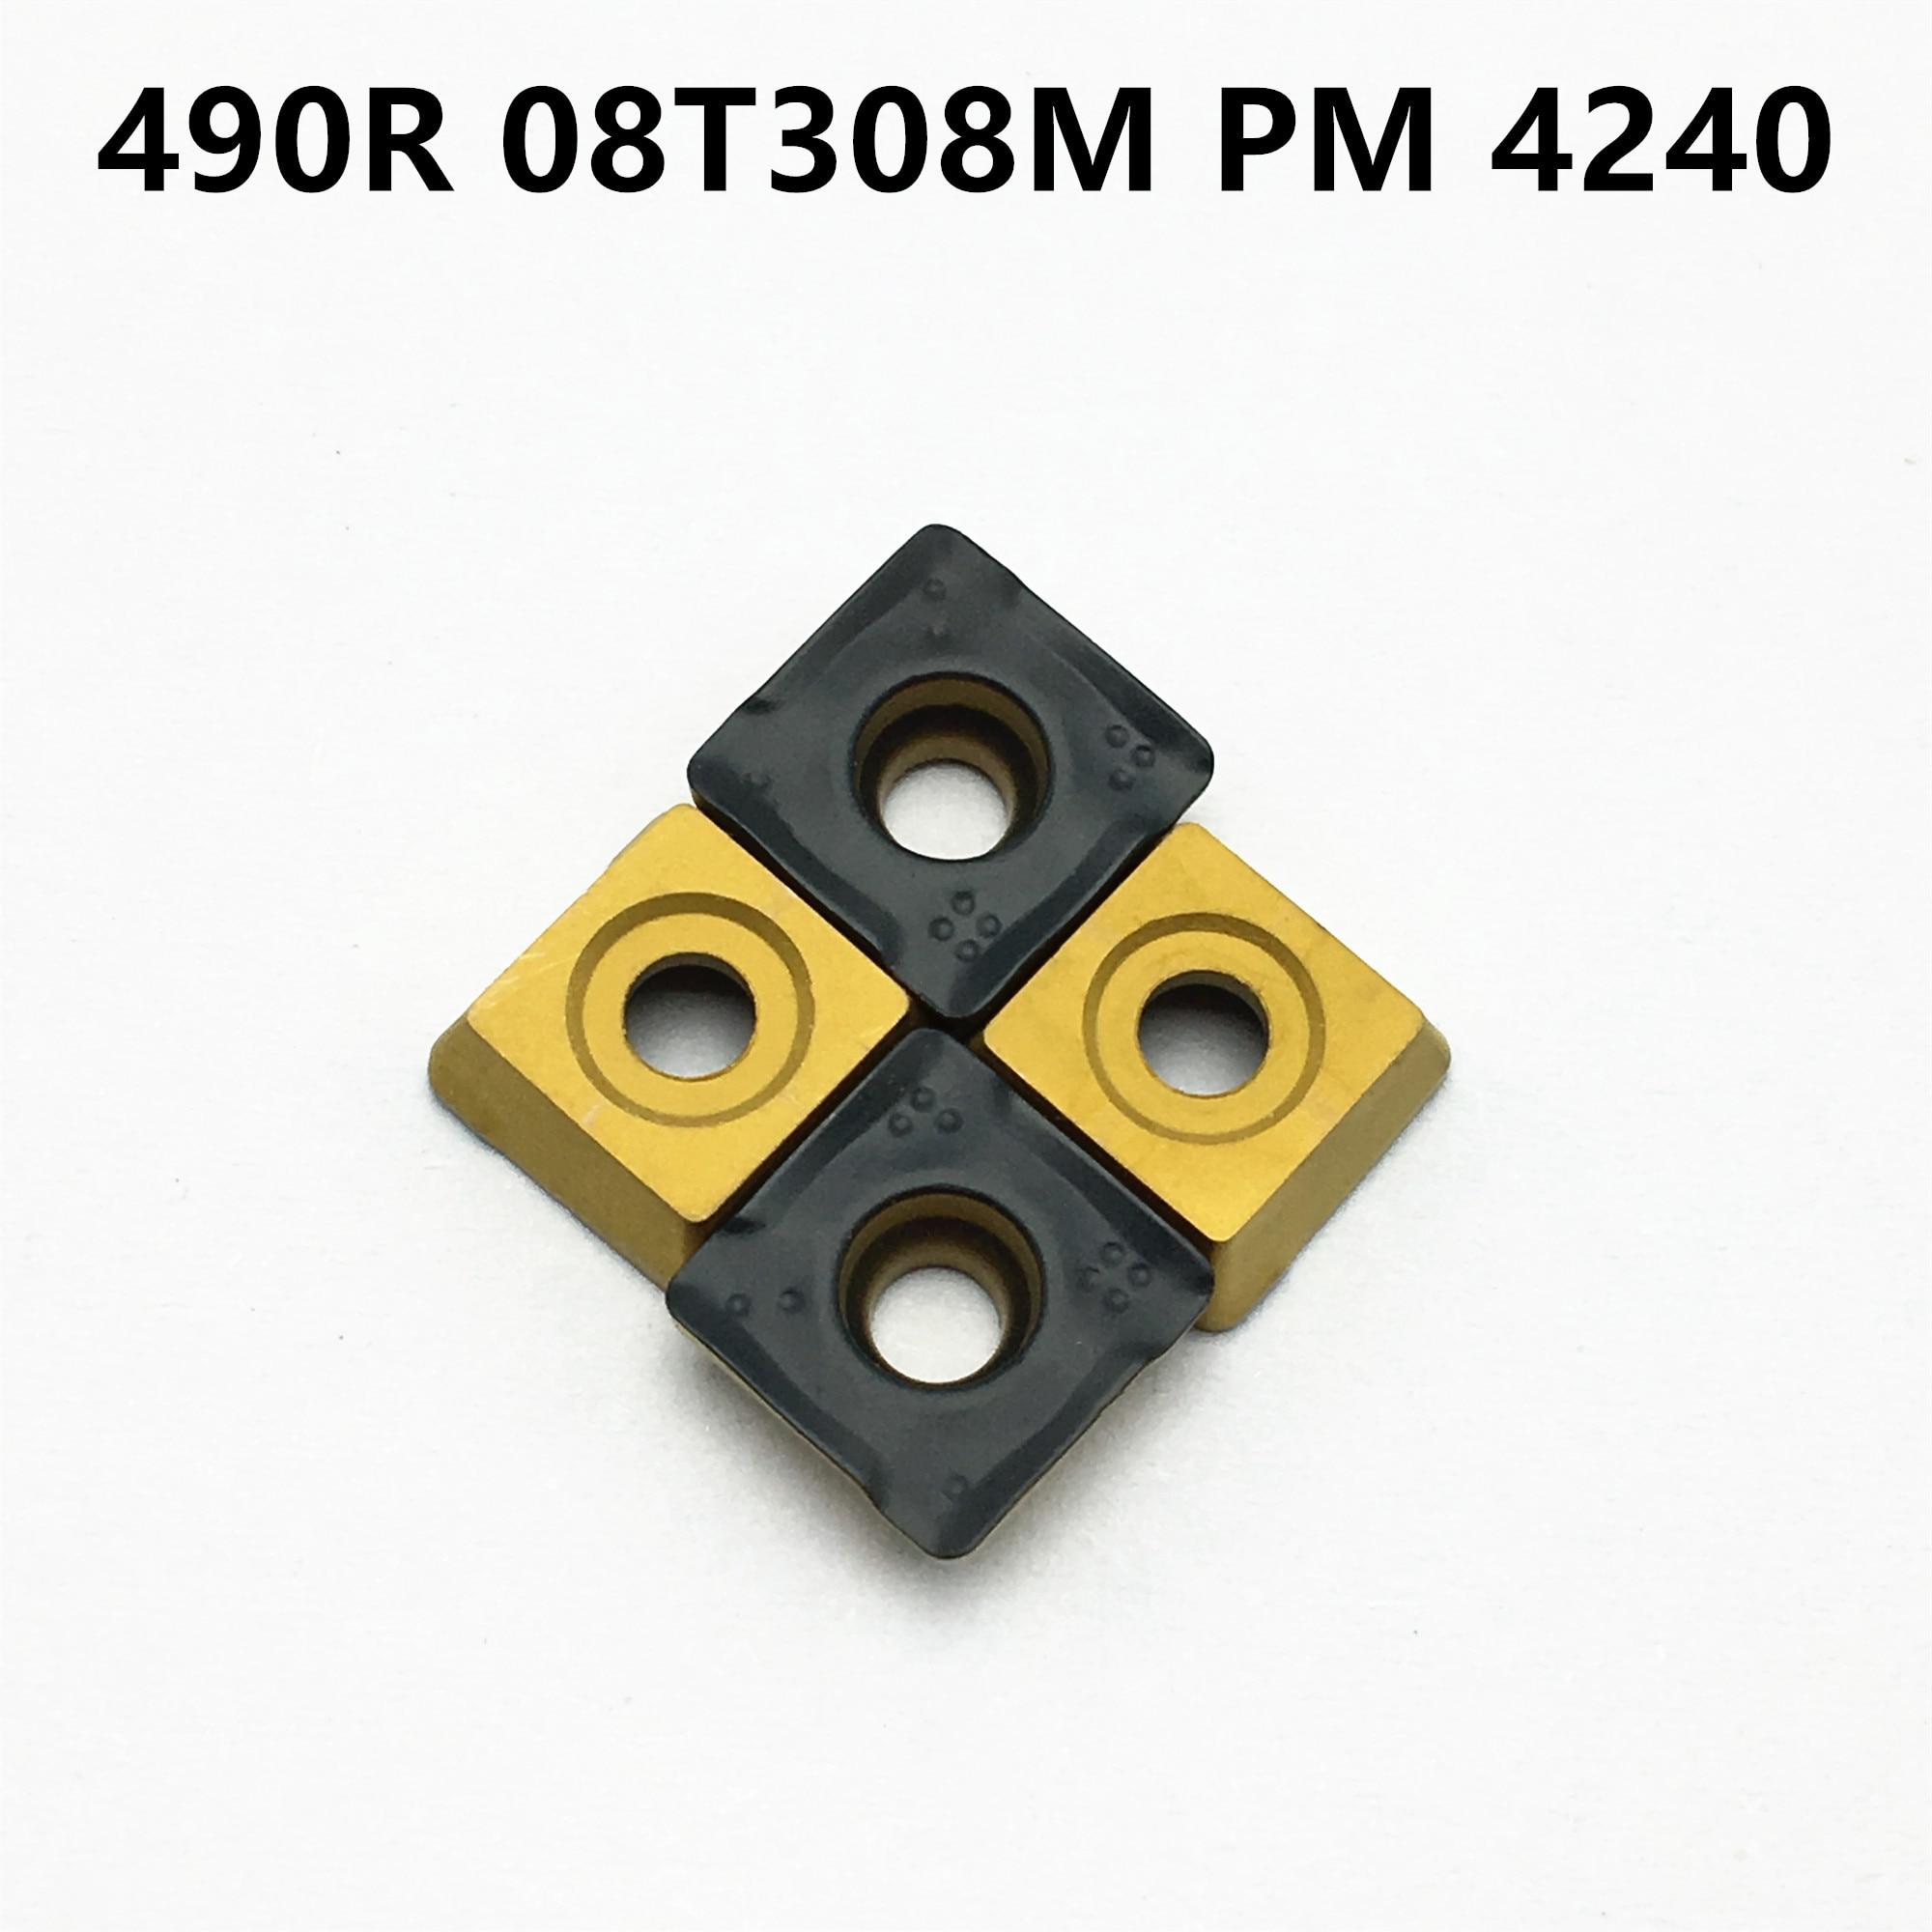 High Quality 490R 08T308M PM4240 490R08T308M PM 4240 CNC Carbide Turning Insert Cutting Blade 490R